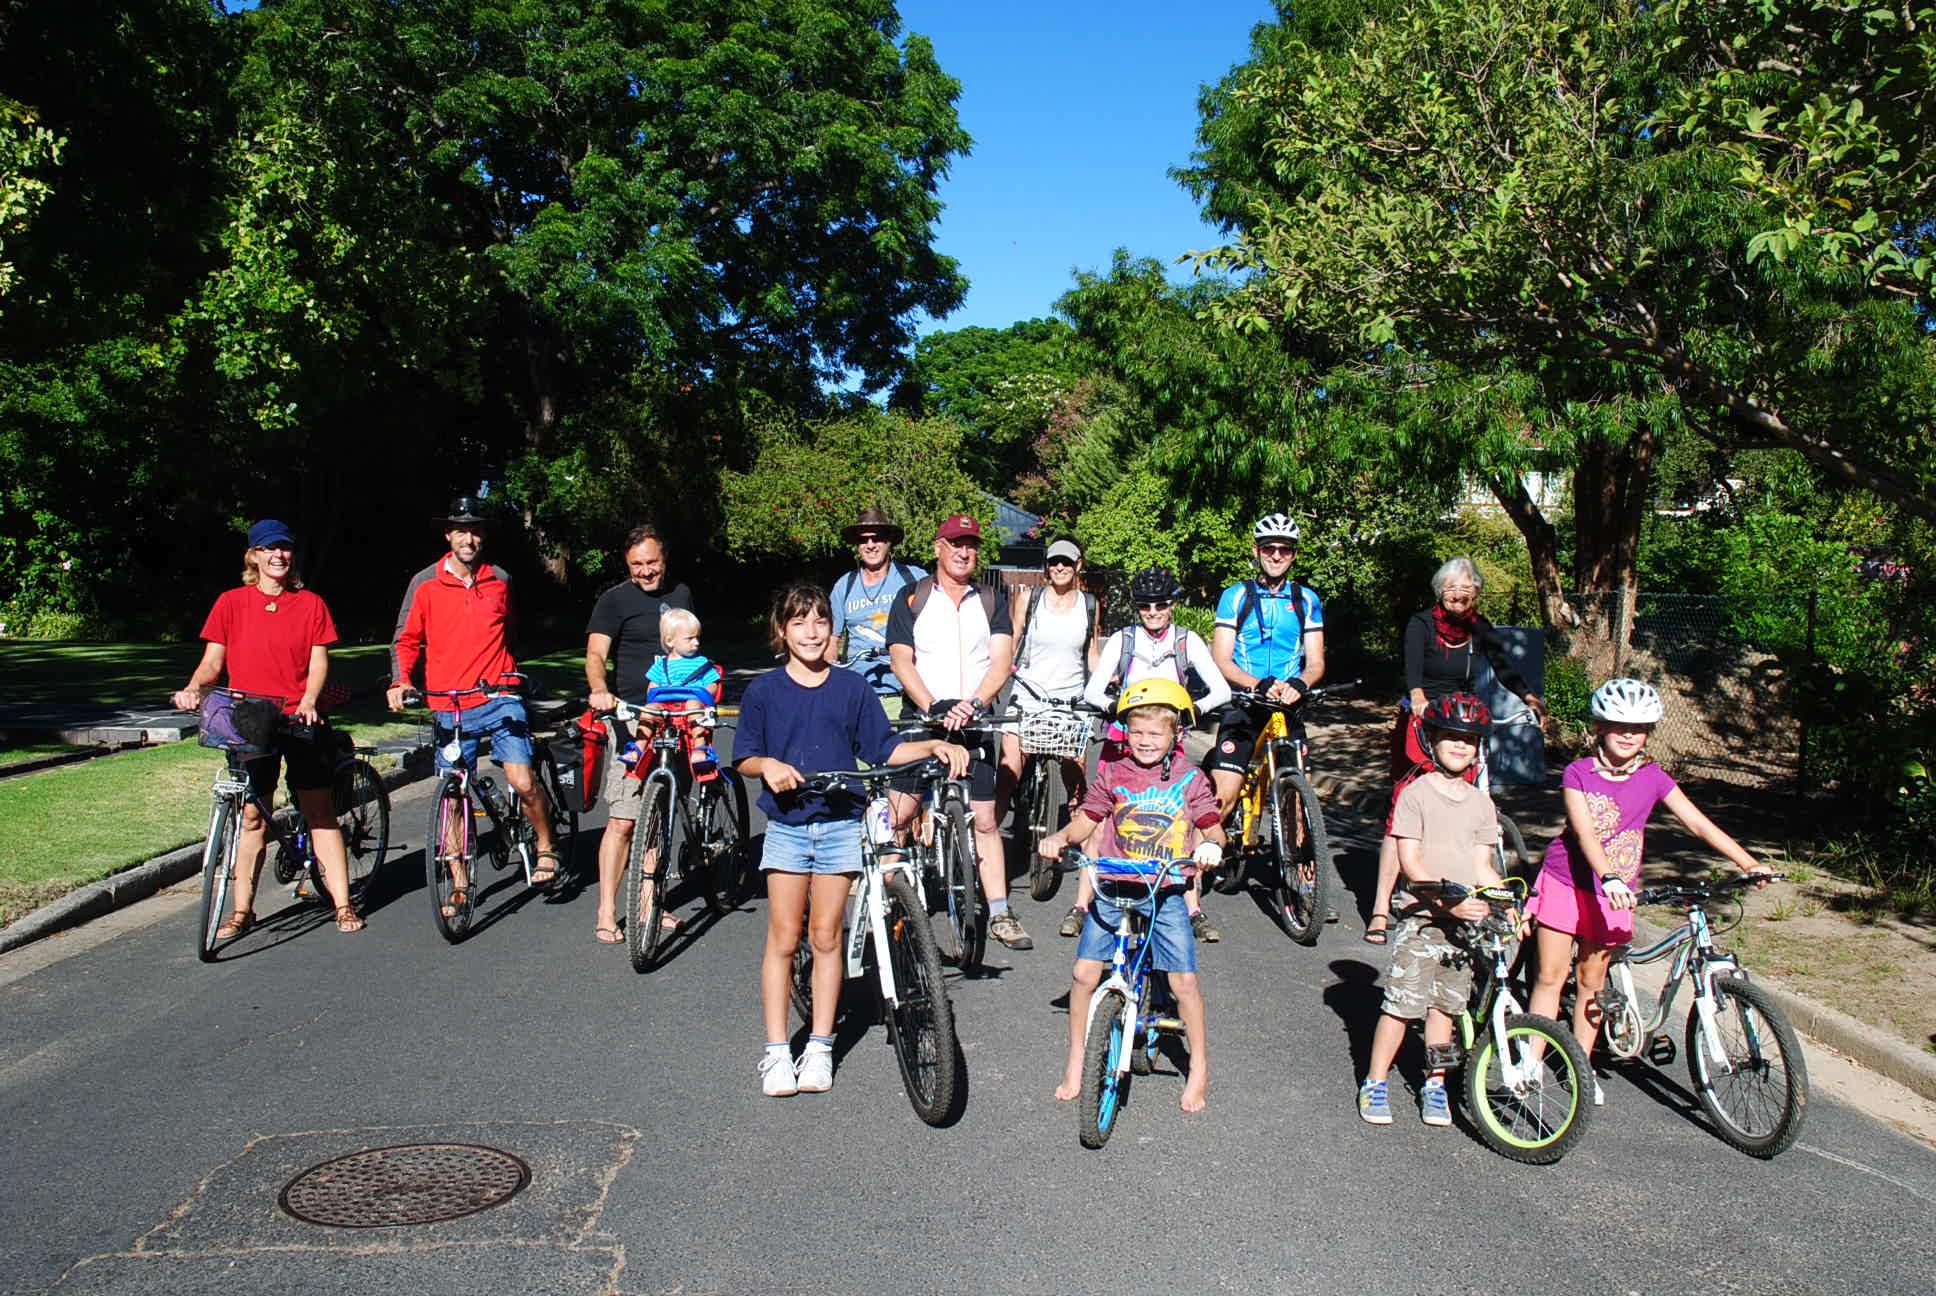 Skryf in vir Stellenbosch Fietsry se derde Bosfietsberaad oor Fietstoerisme